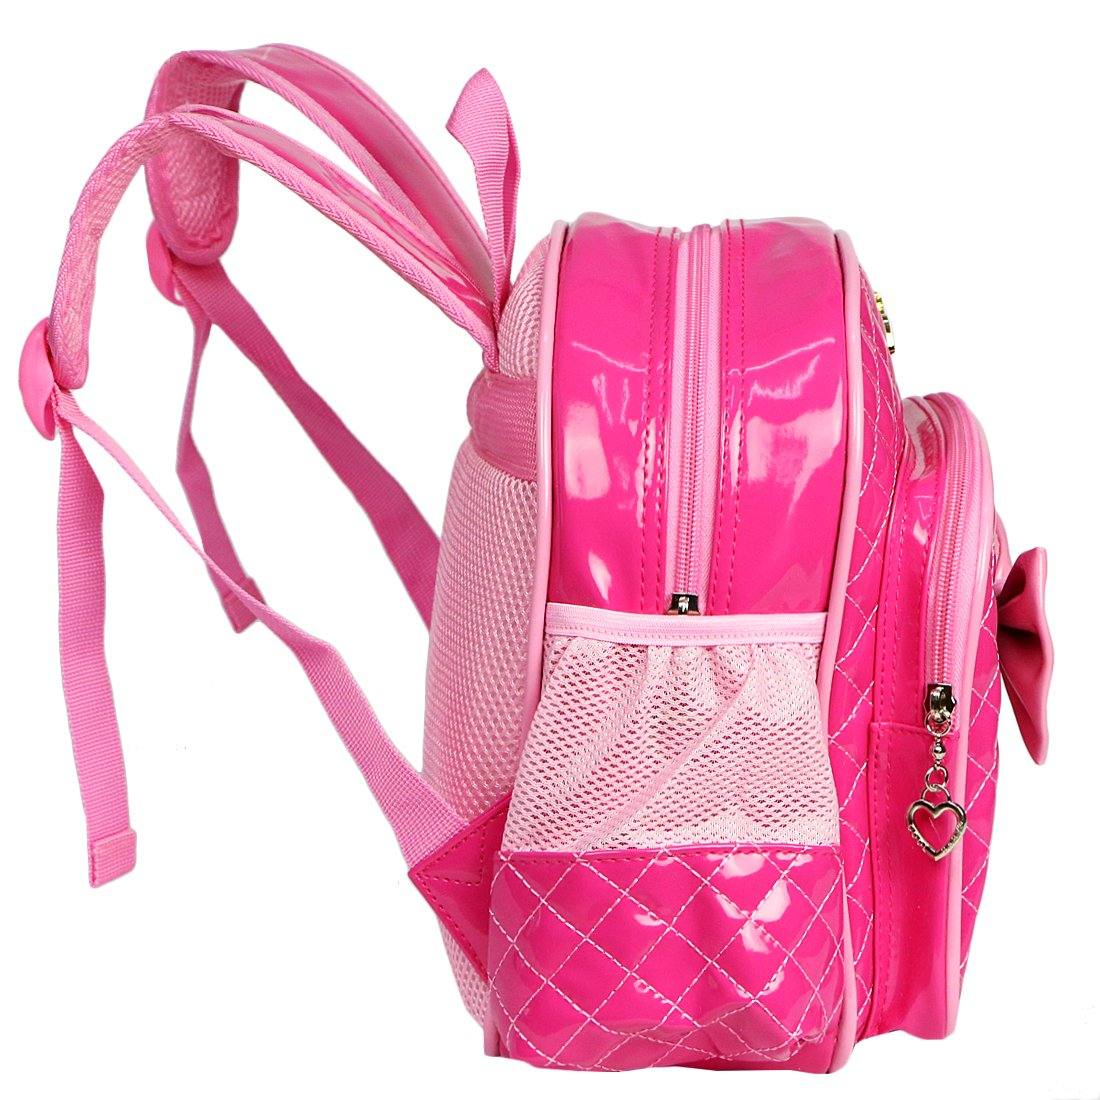 37f07acadb7 Red   kilofly Kids Preschool Kindergarten Little Girl School Backpack + Zippered  Pouch  Amazon.in  Home   Kitchen